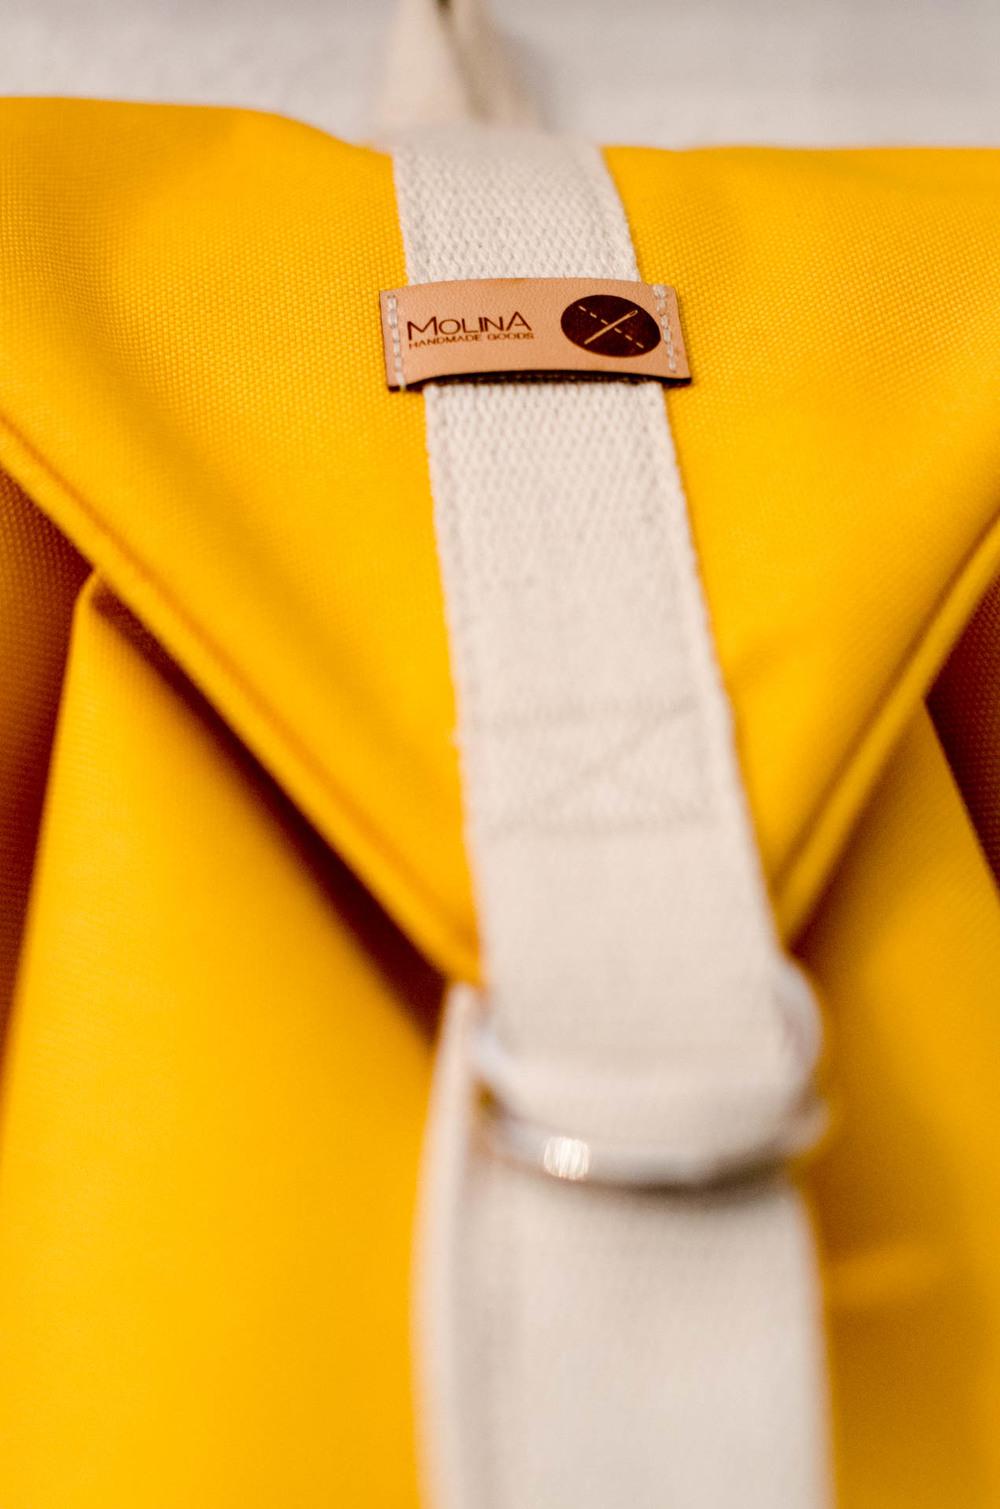 molina_design_made_in_cologne_wearecity_koeln-8.jpg